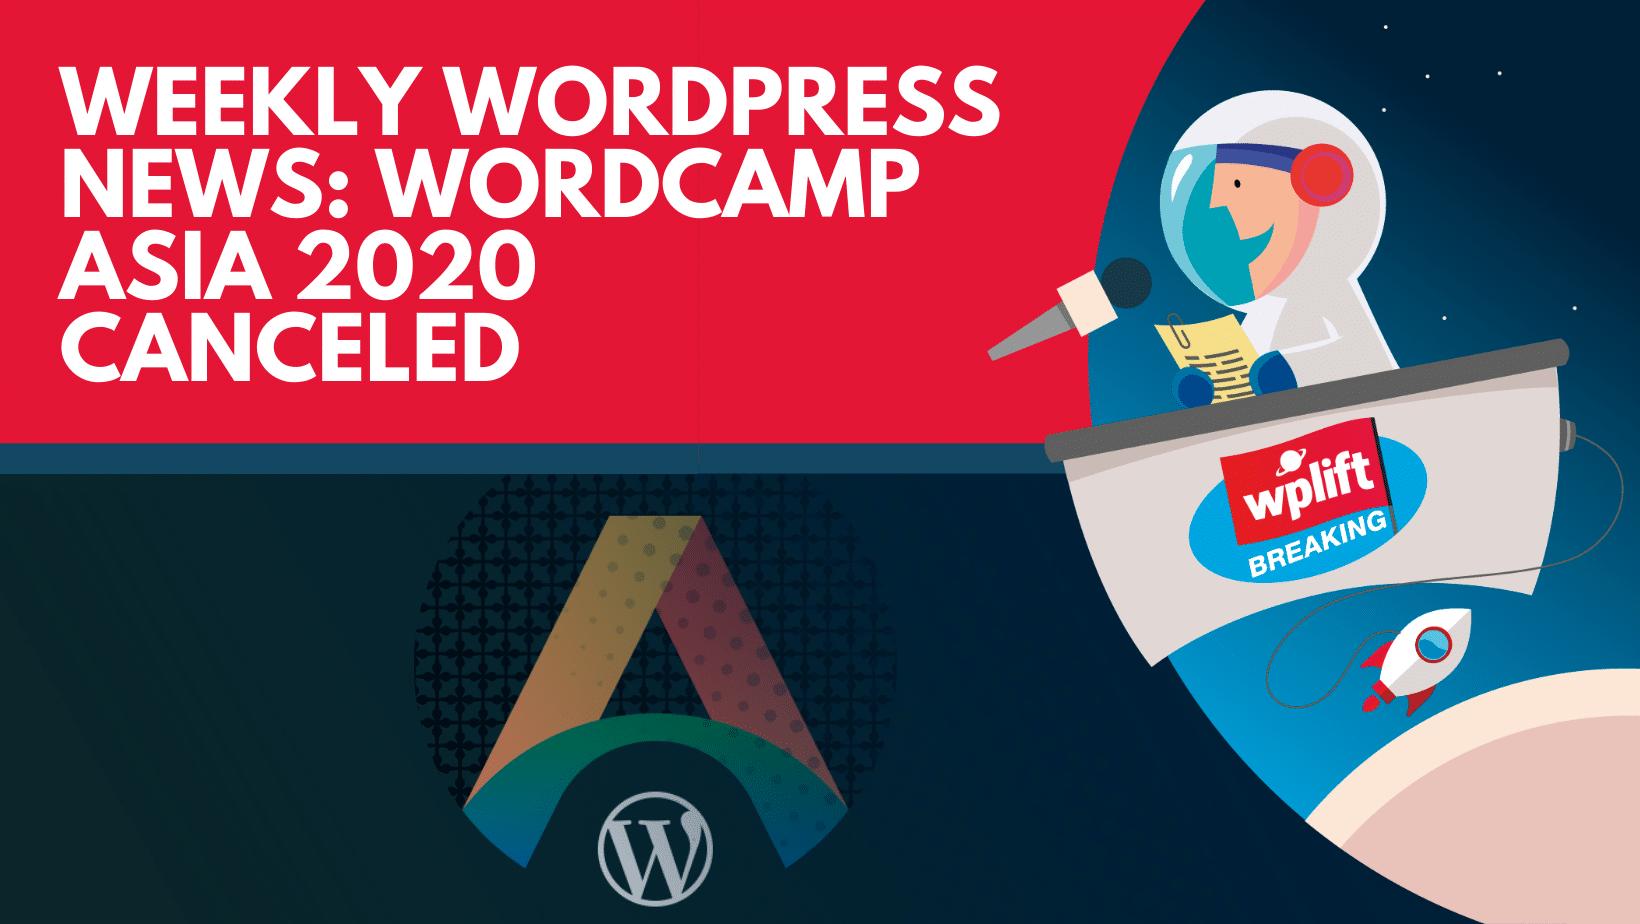 Weekly WordPress News: WordCamp Asia 2020 Canceled